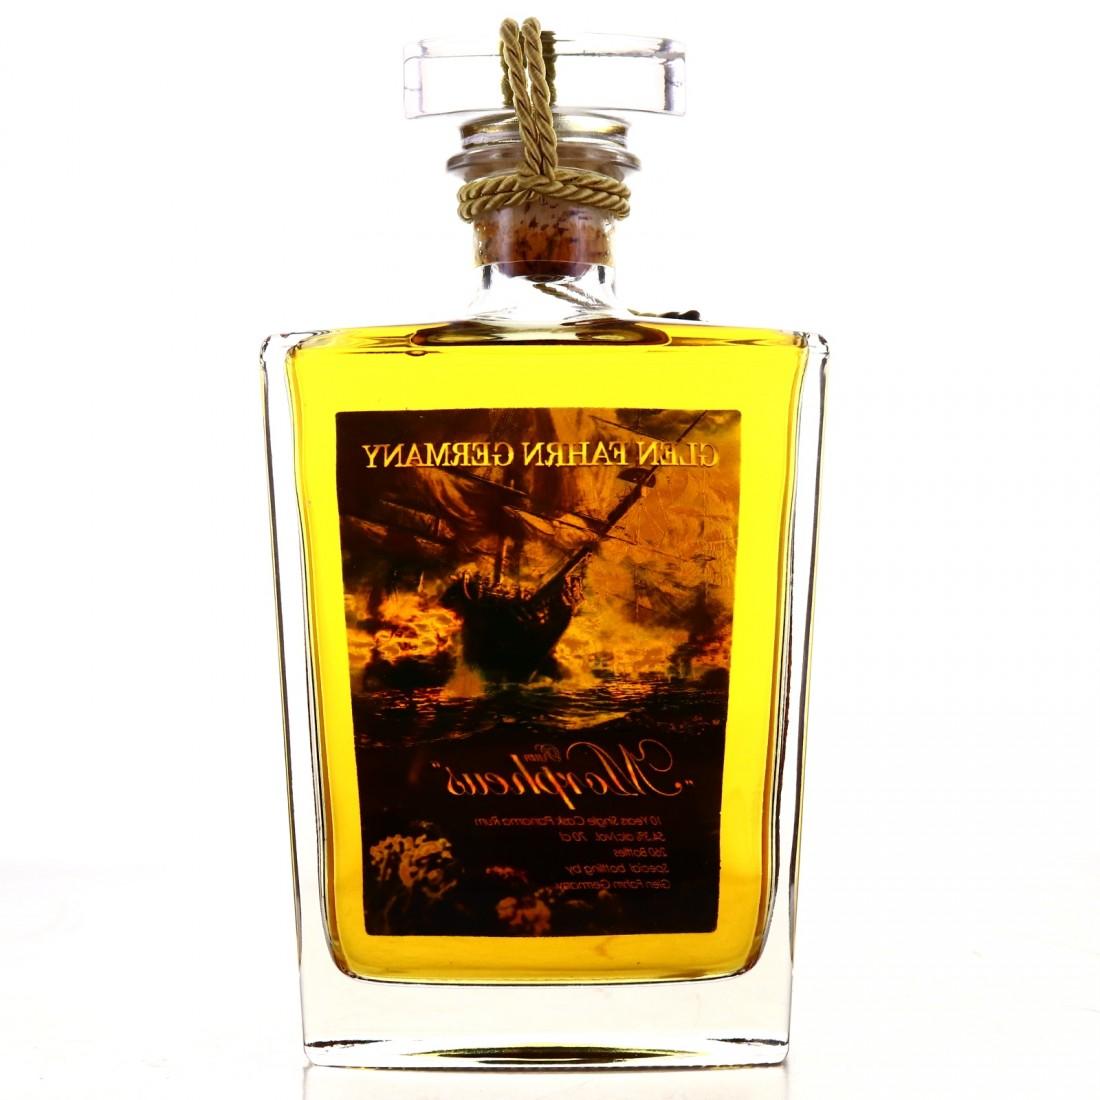 Morpheus 10 Year Old Panamanian Rum Glen Fahrn Germany